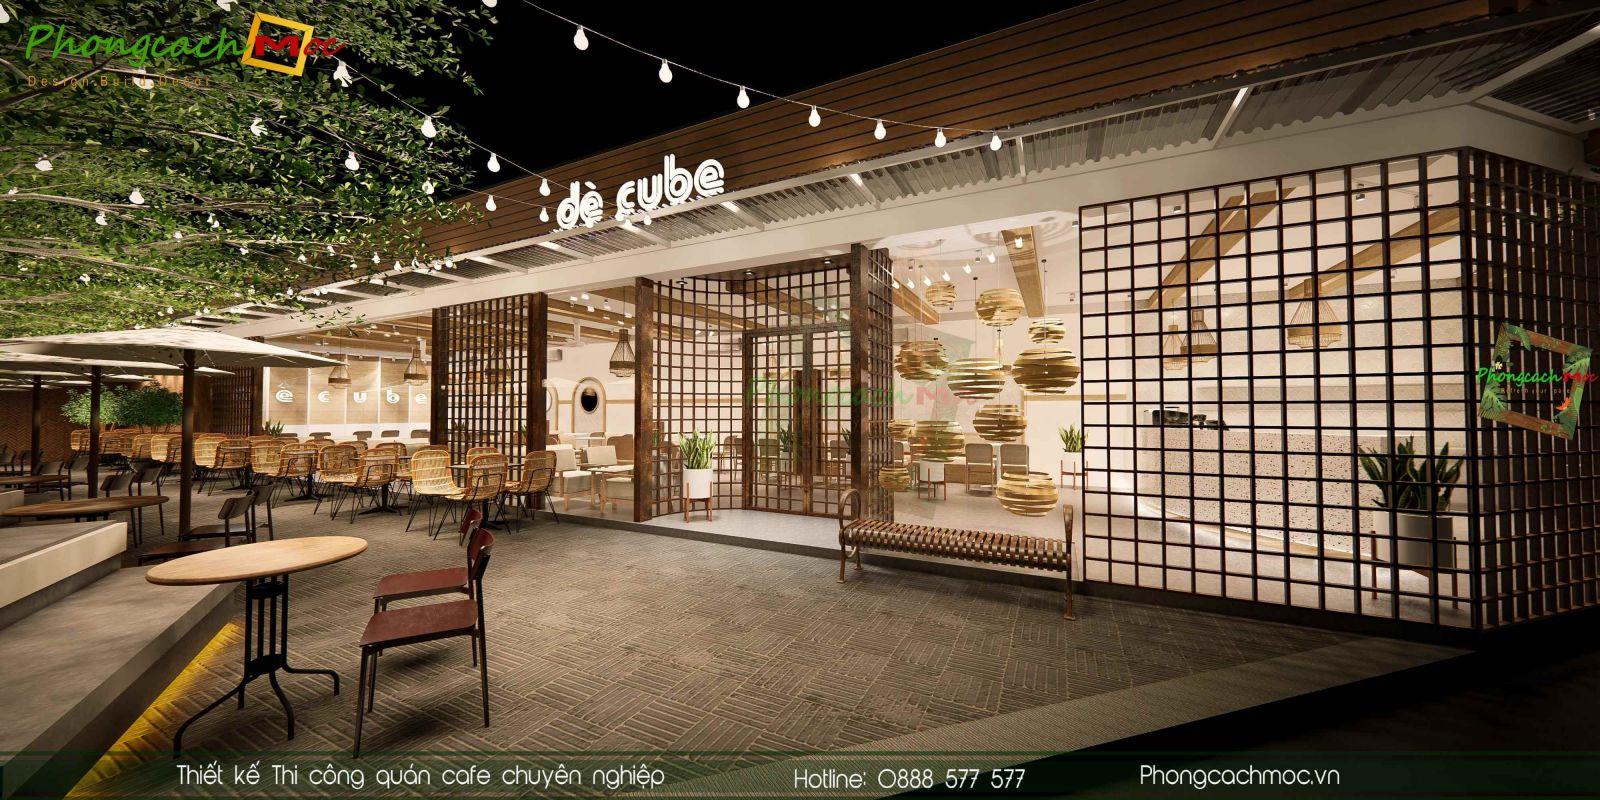 Thiet ke khong gian cafe ngoai troi De Cube Coffee & Tea